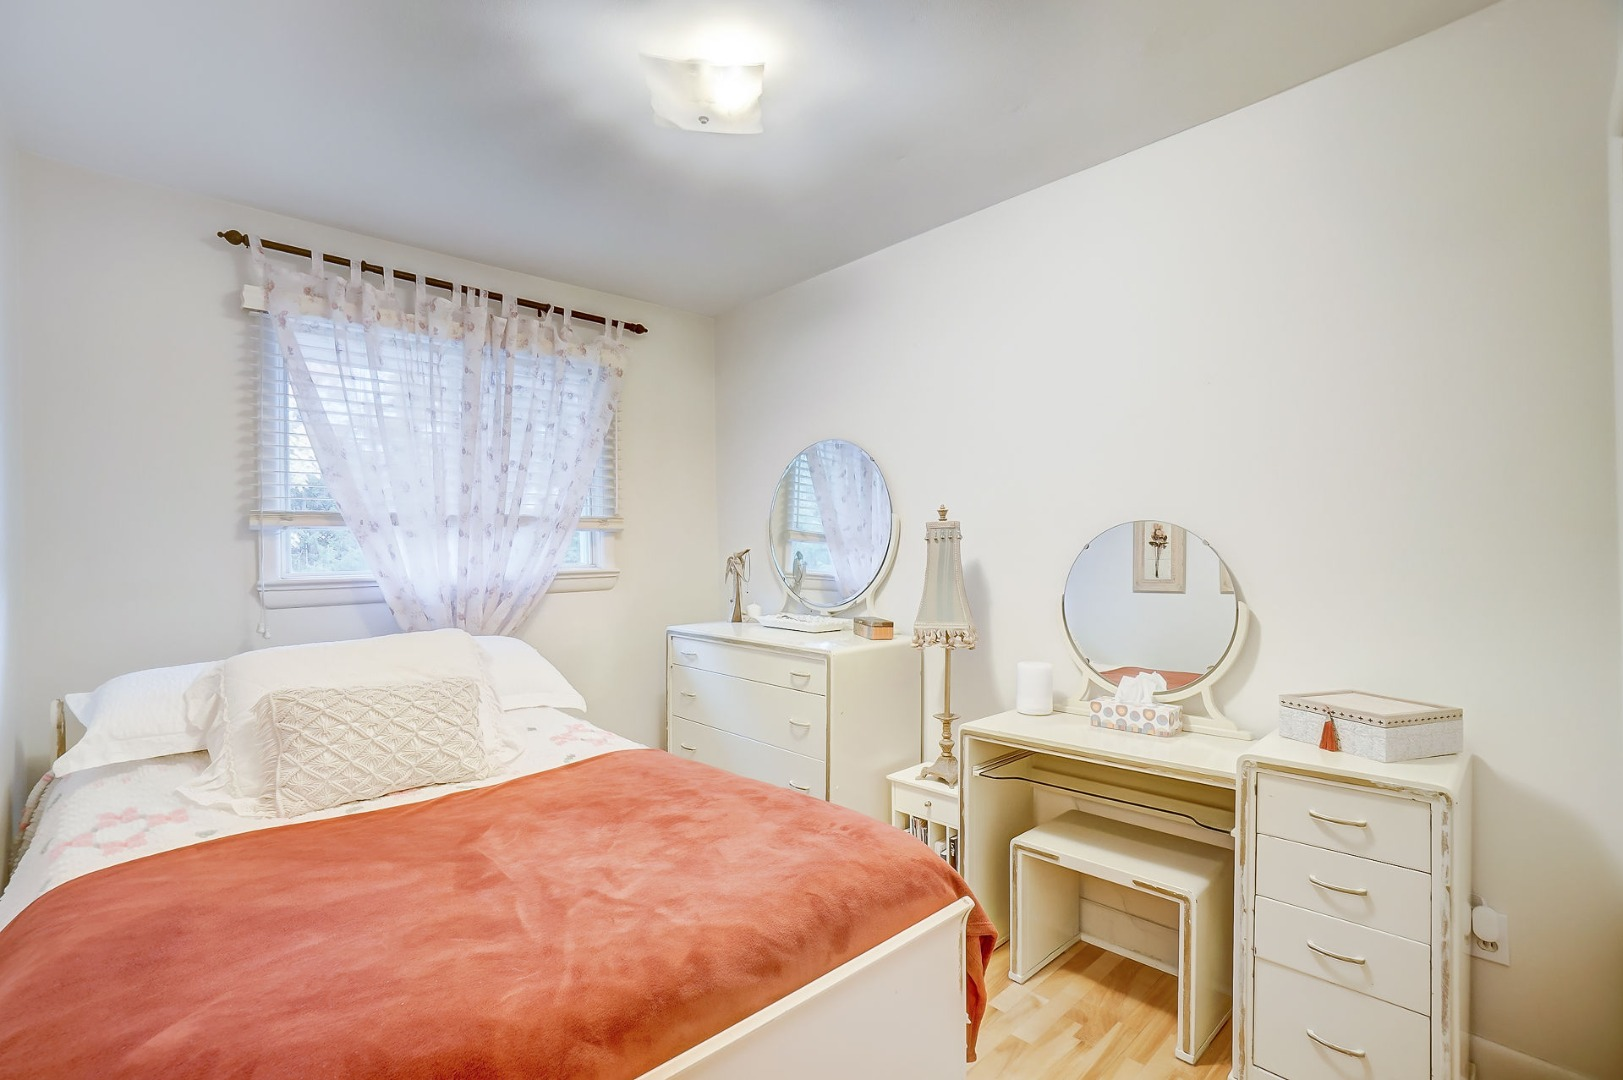 Maison à vendre Hull - 158, rue Isabelle